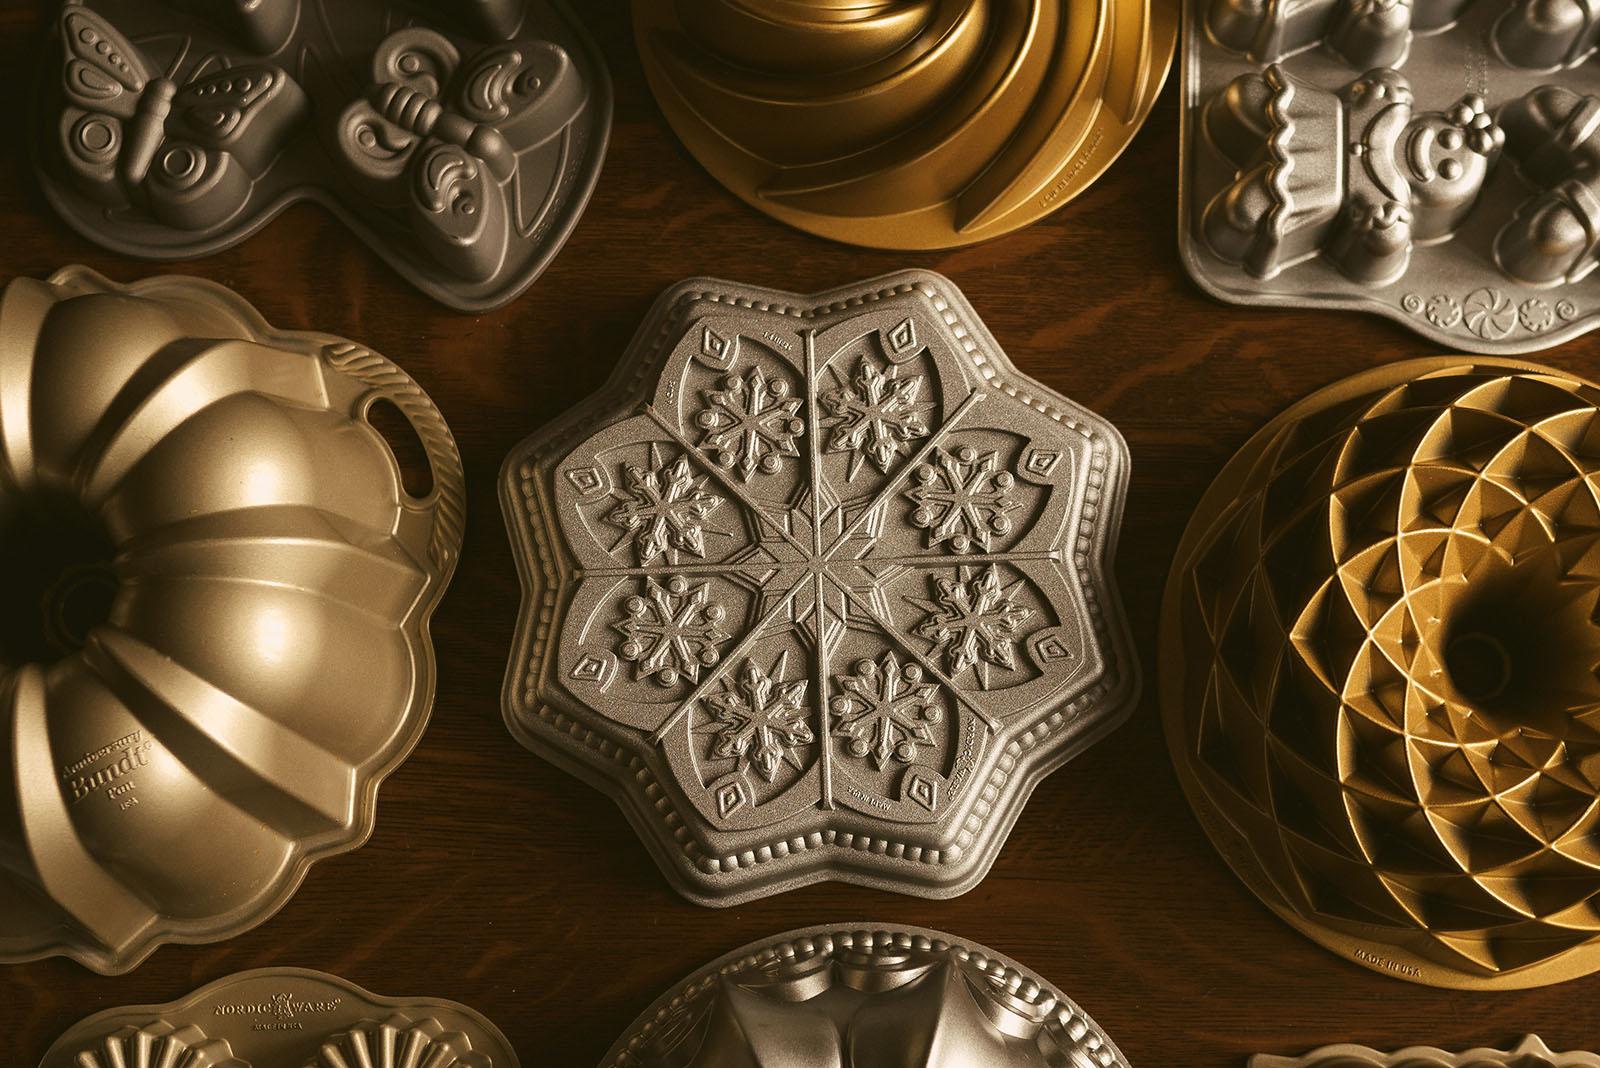 Nordic Ware pans by Caroline Jensen